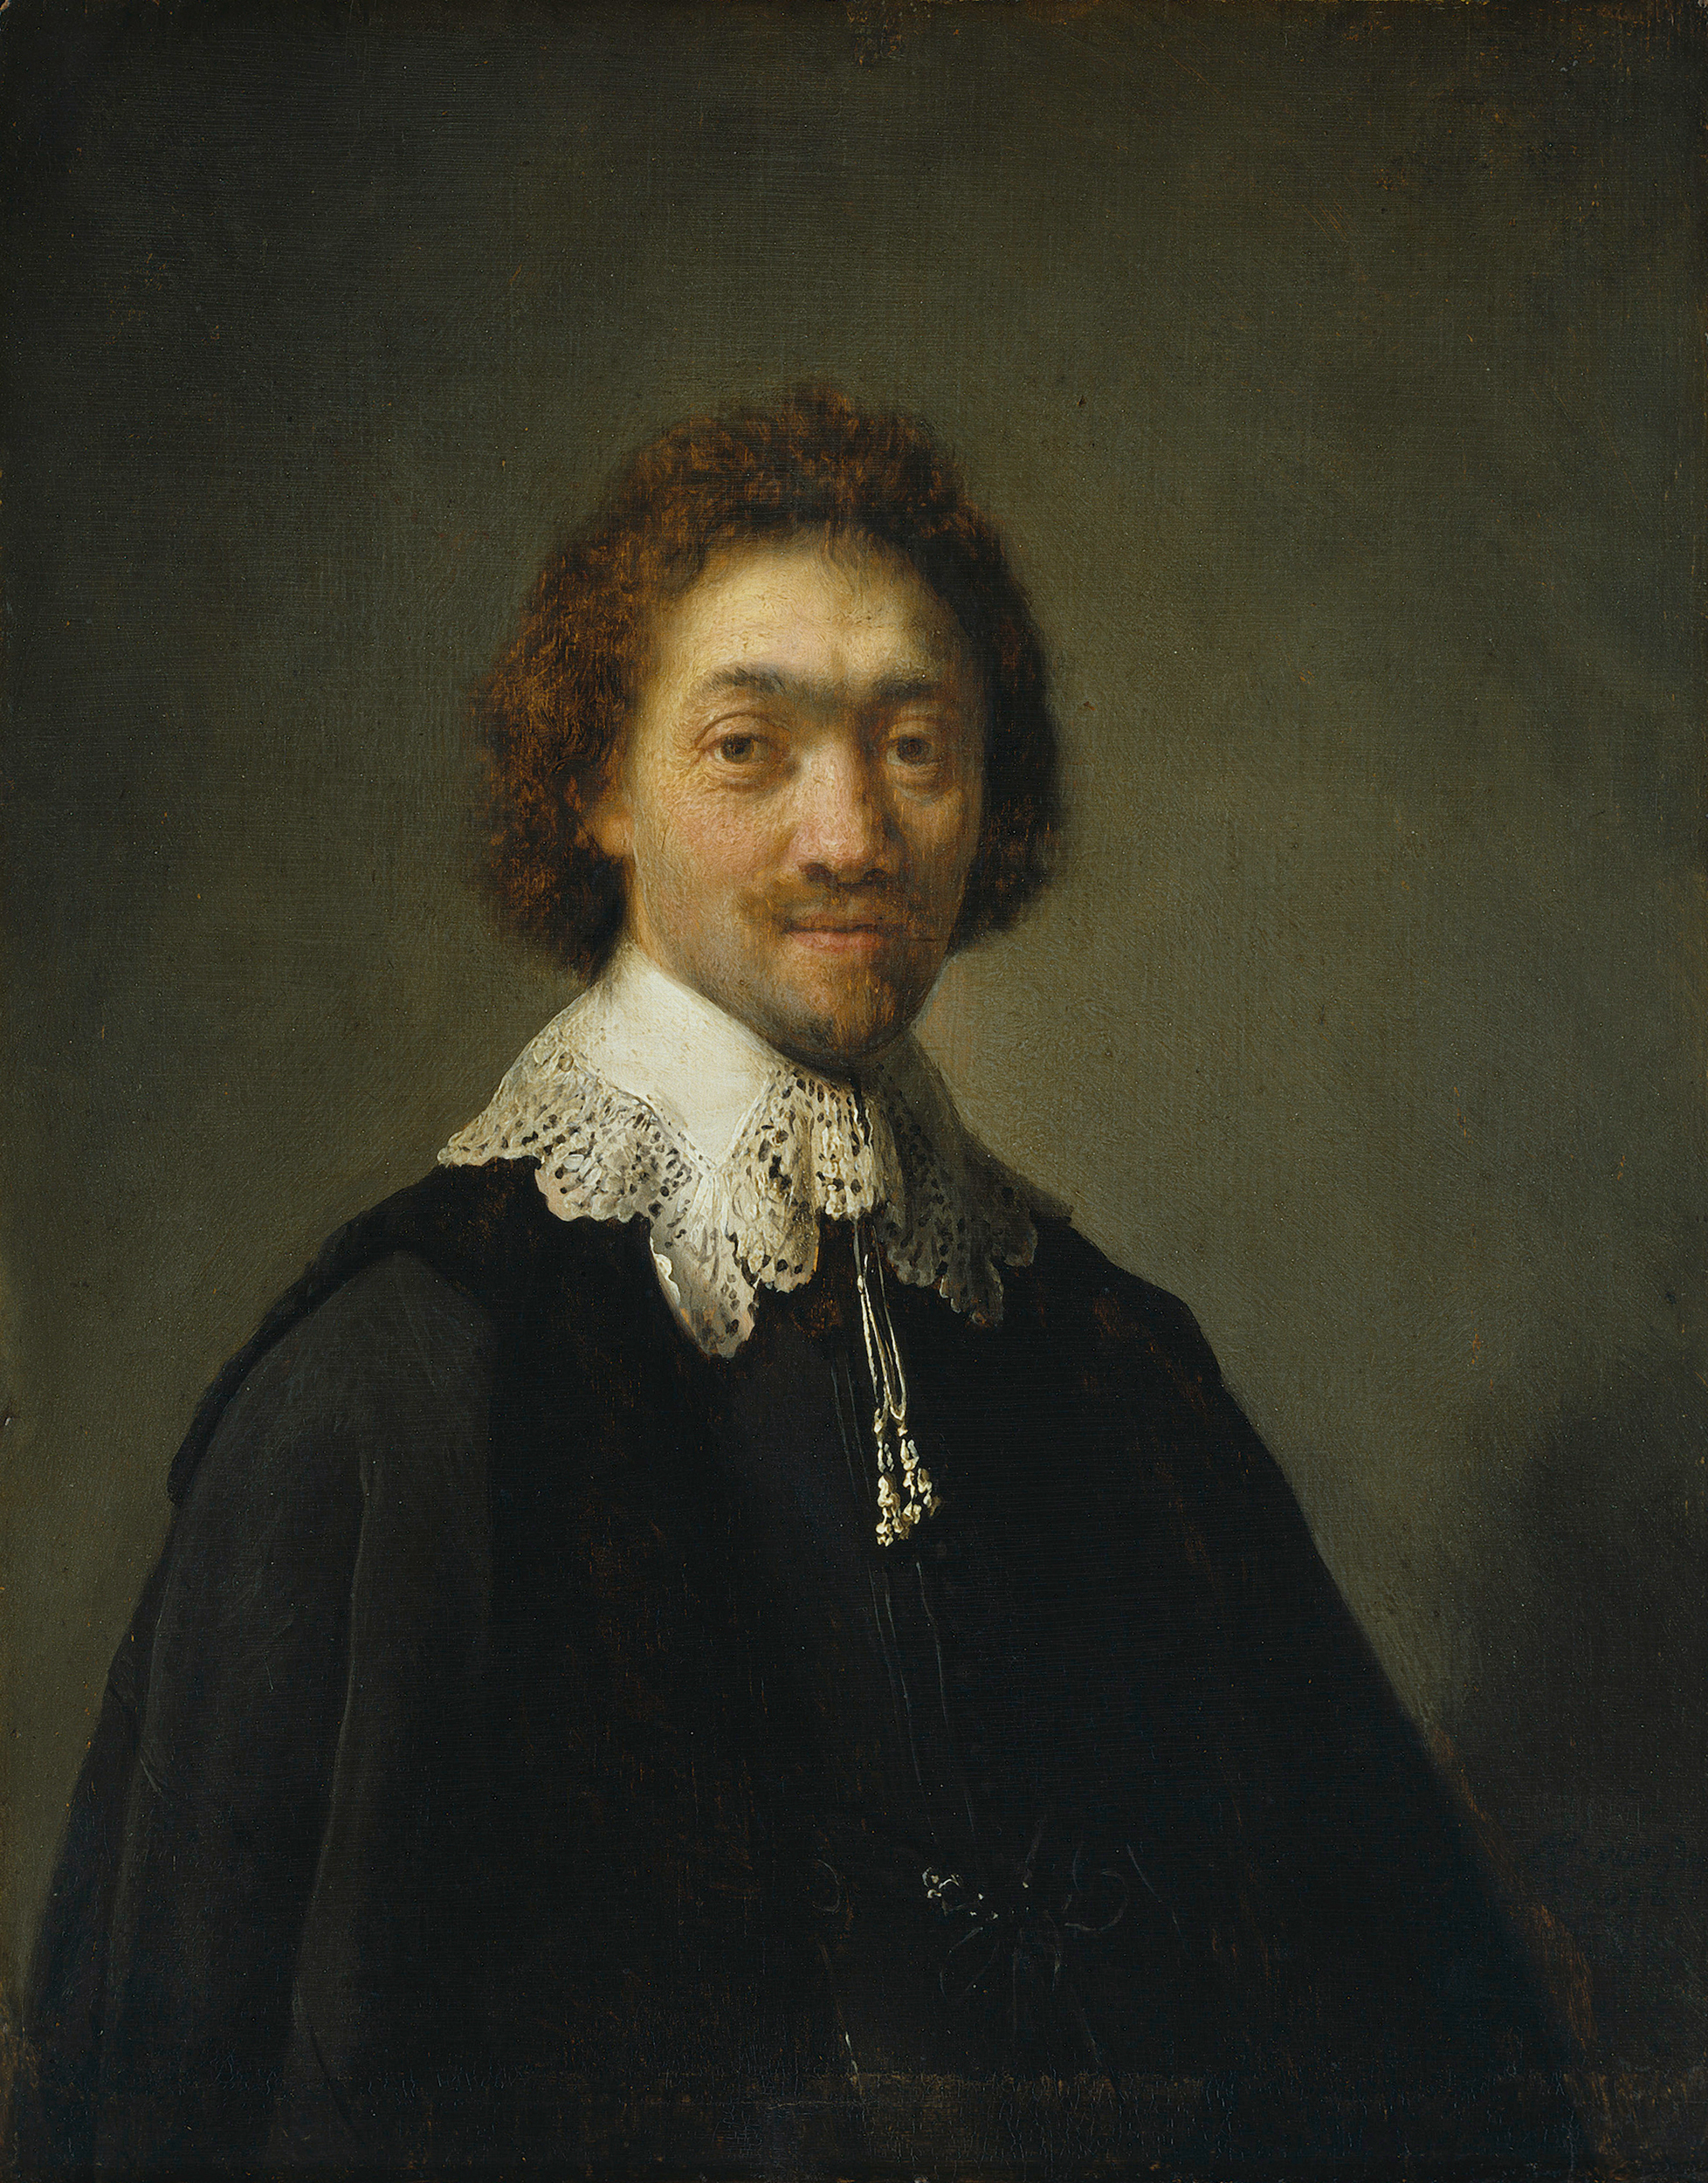 Rembrand Harmensz. van Rijn (1606-1669): Maurits Huygens, Sekretär des Staatsrats in Den Haag, 1632 © Hamburger Kunsthalle / bpk, Foto: Elke Walford